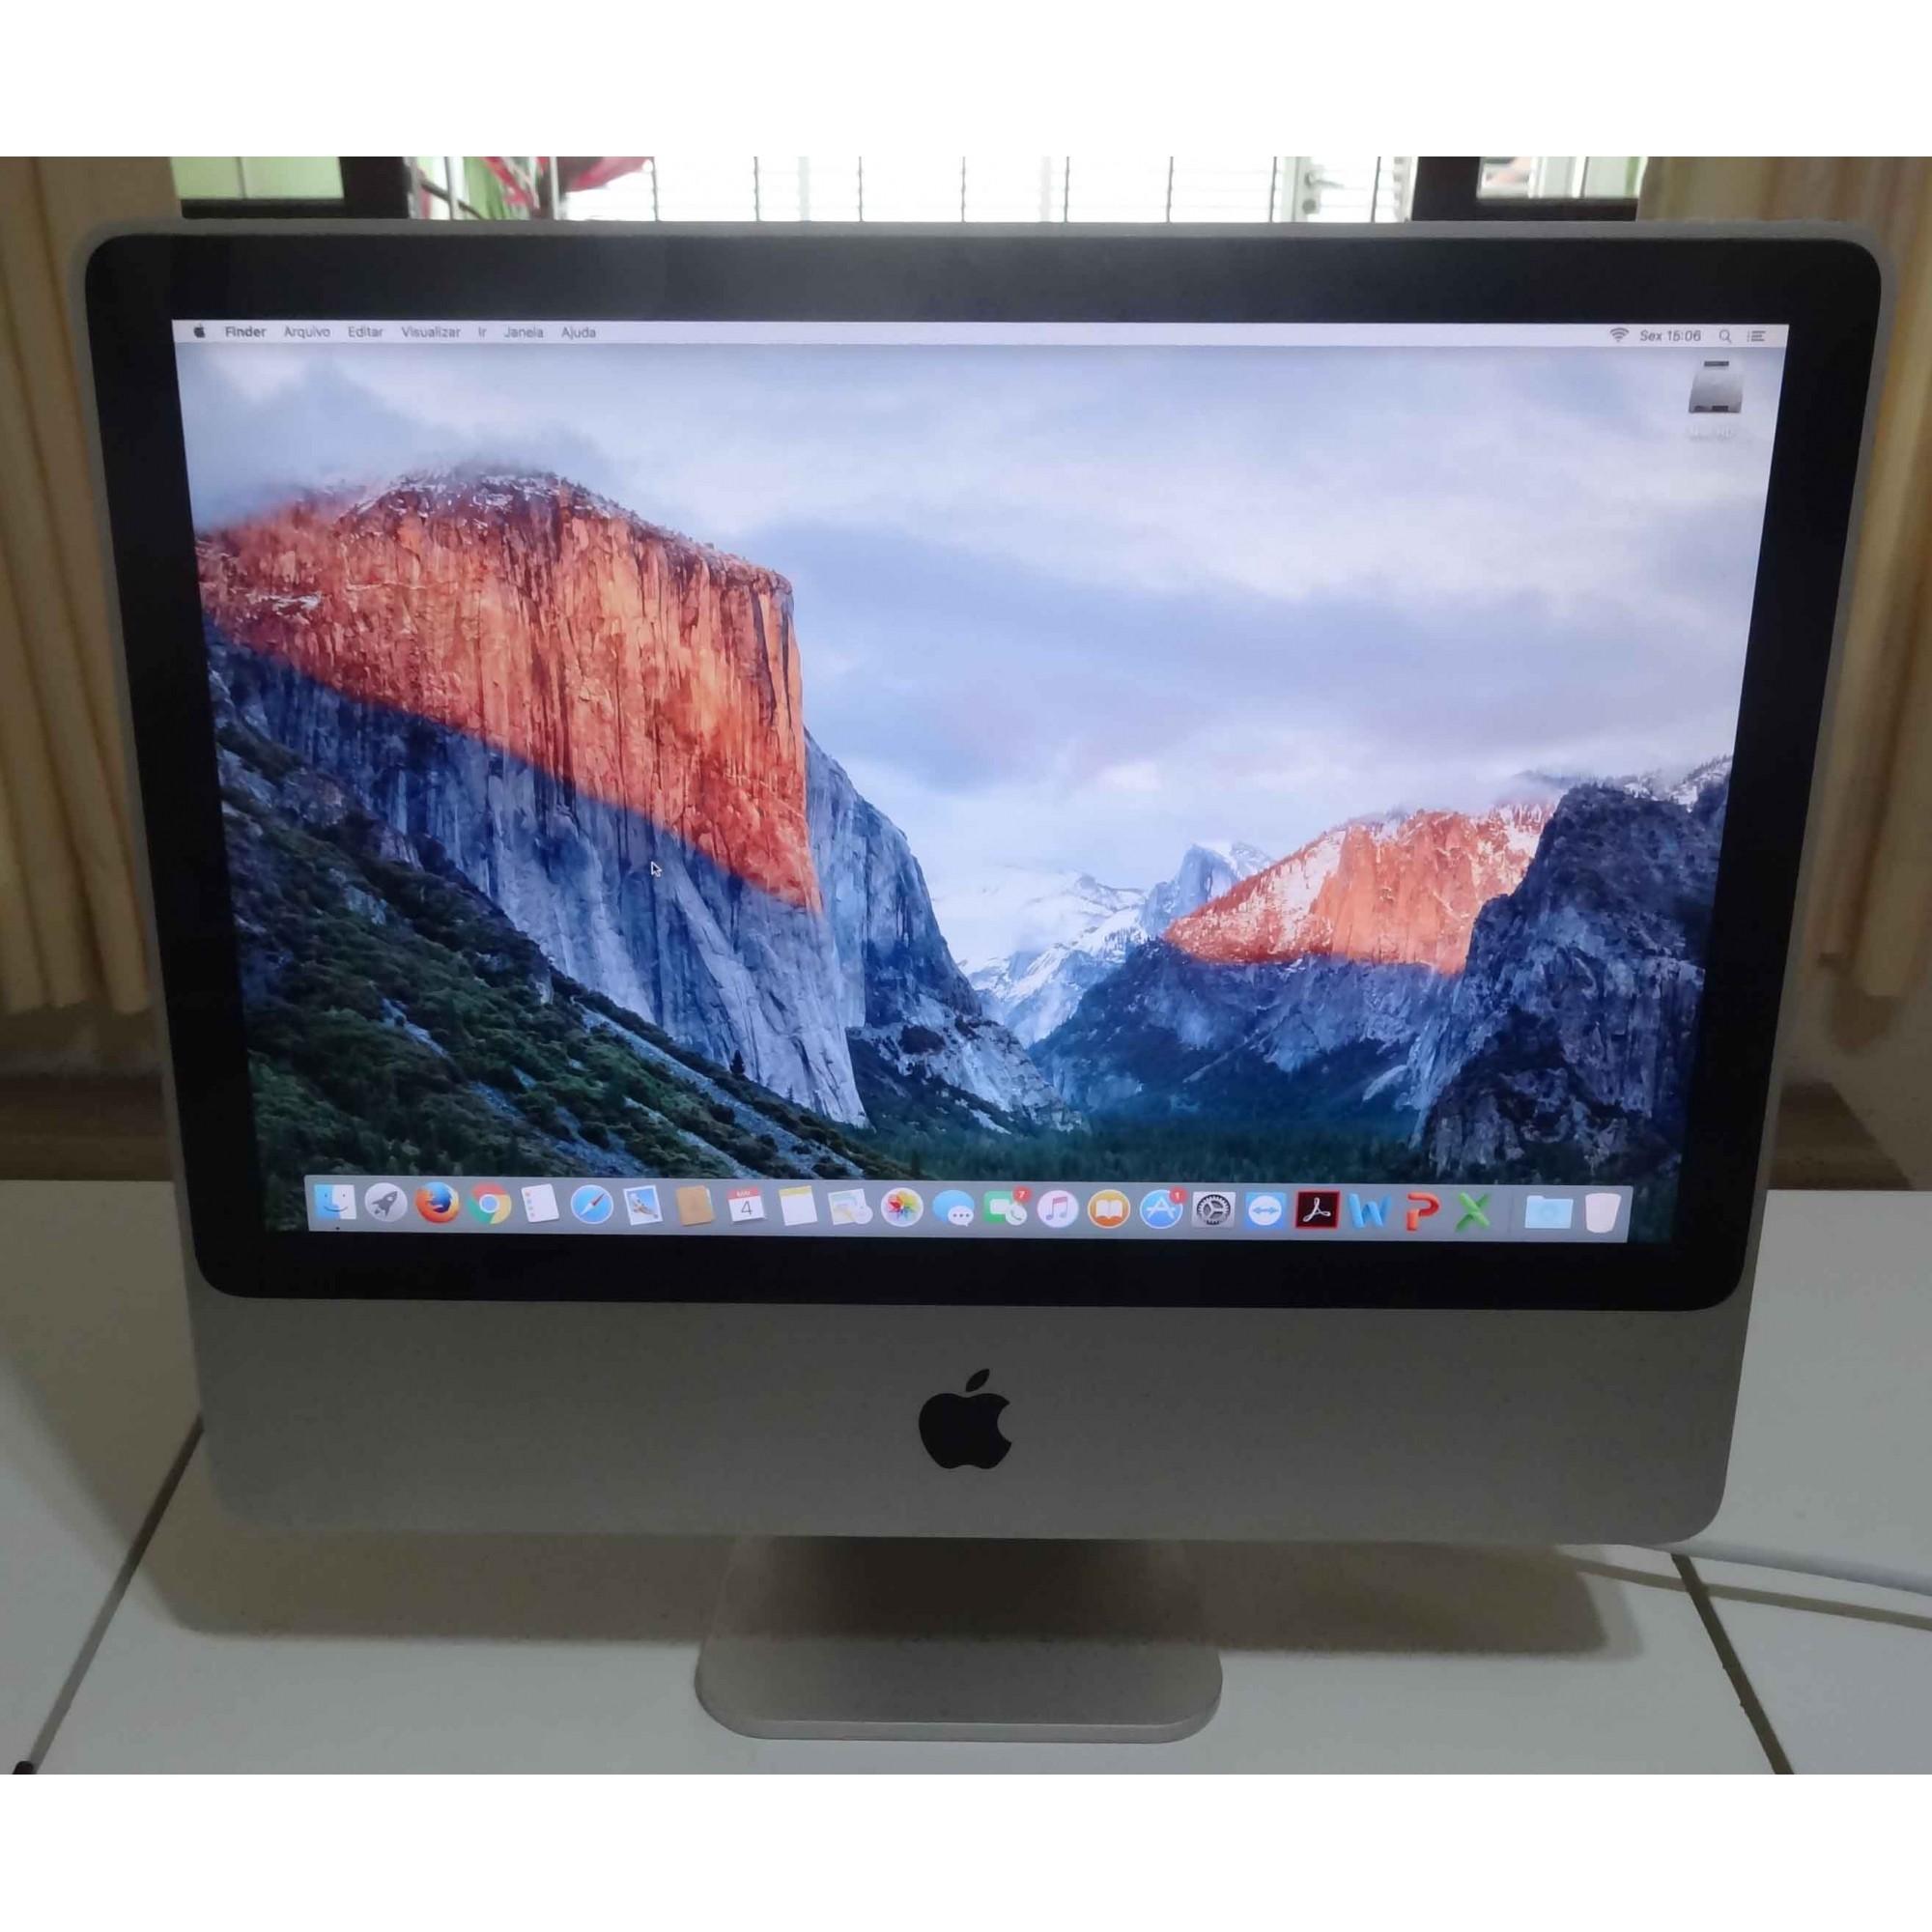 iMac MB324LL/A 20'' Core 2 Duo 2.6GHz 4GB HD-320GB  (NÃO ENVIAMOS)